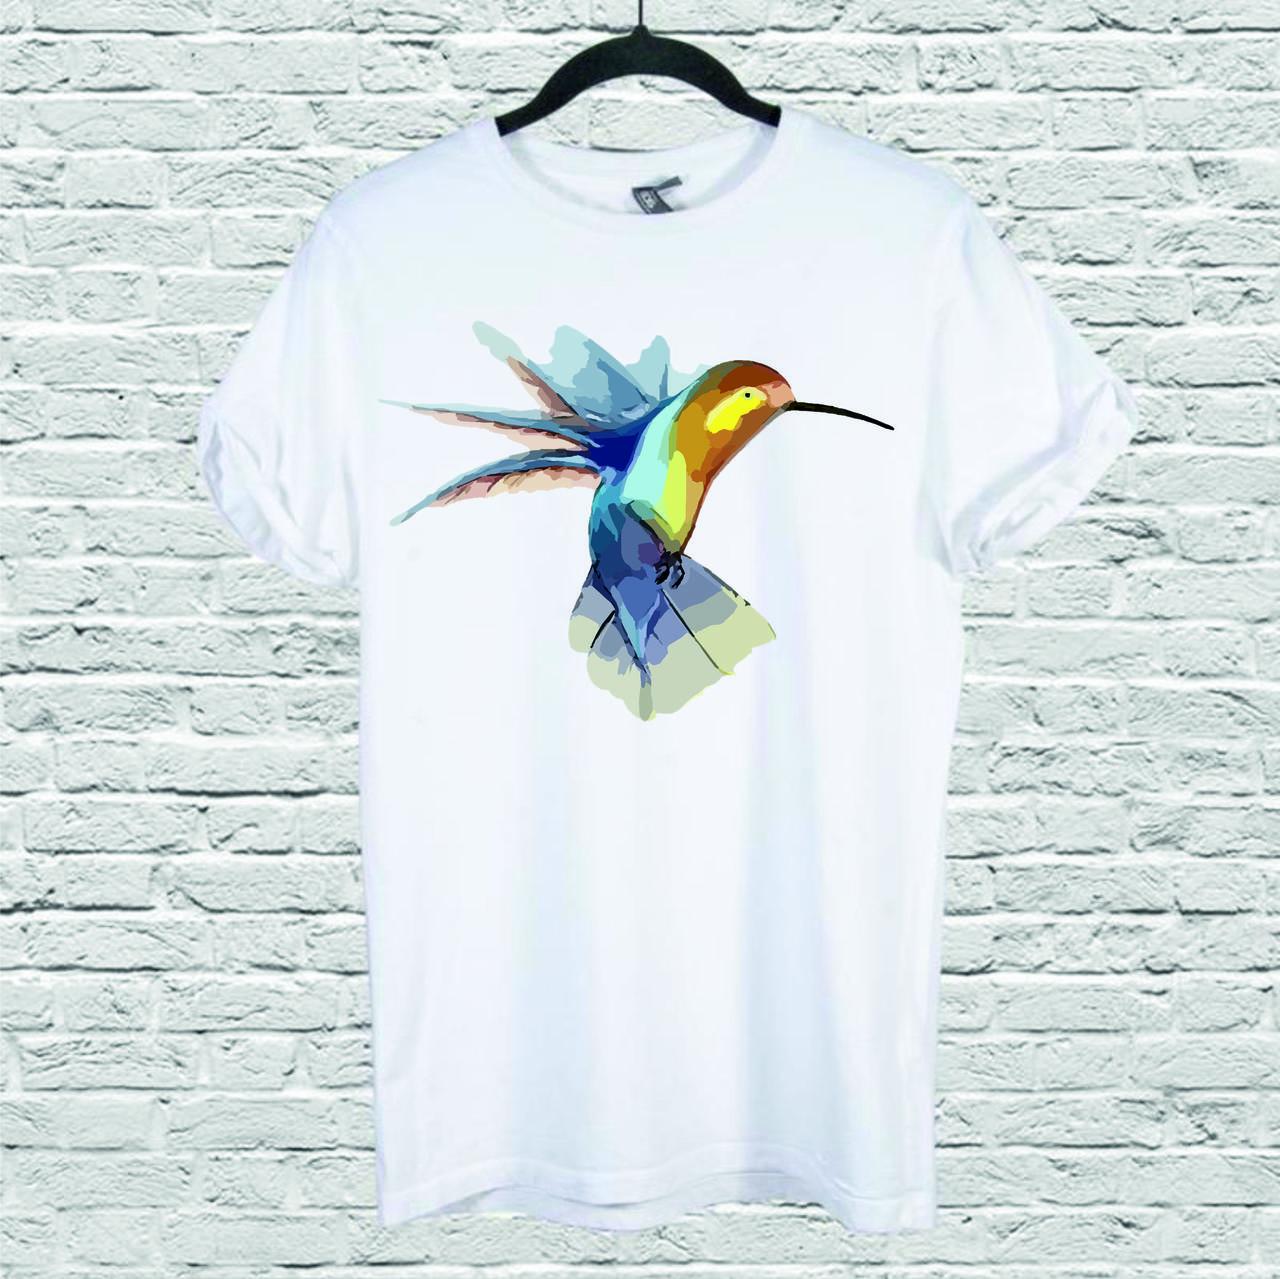 Футболка YOUstyle Hummingbird 0121 M White